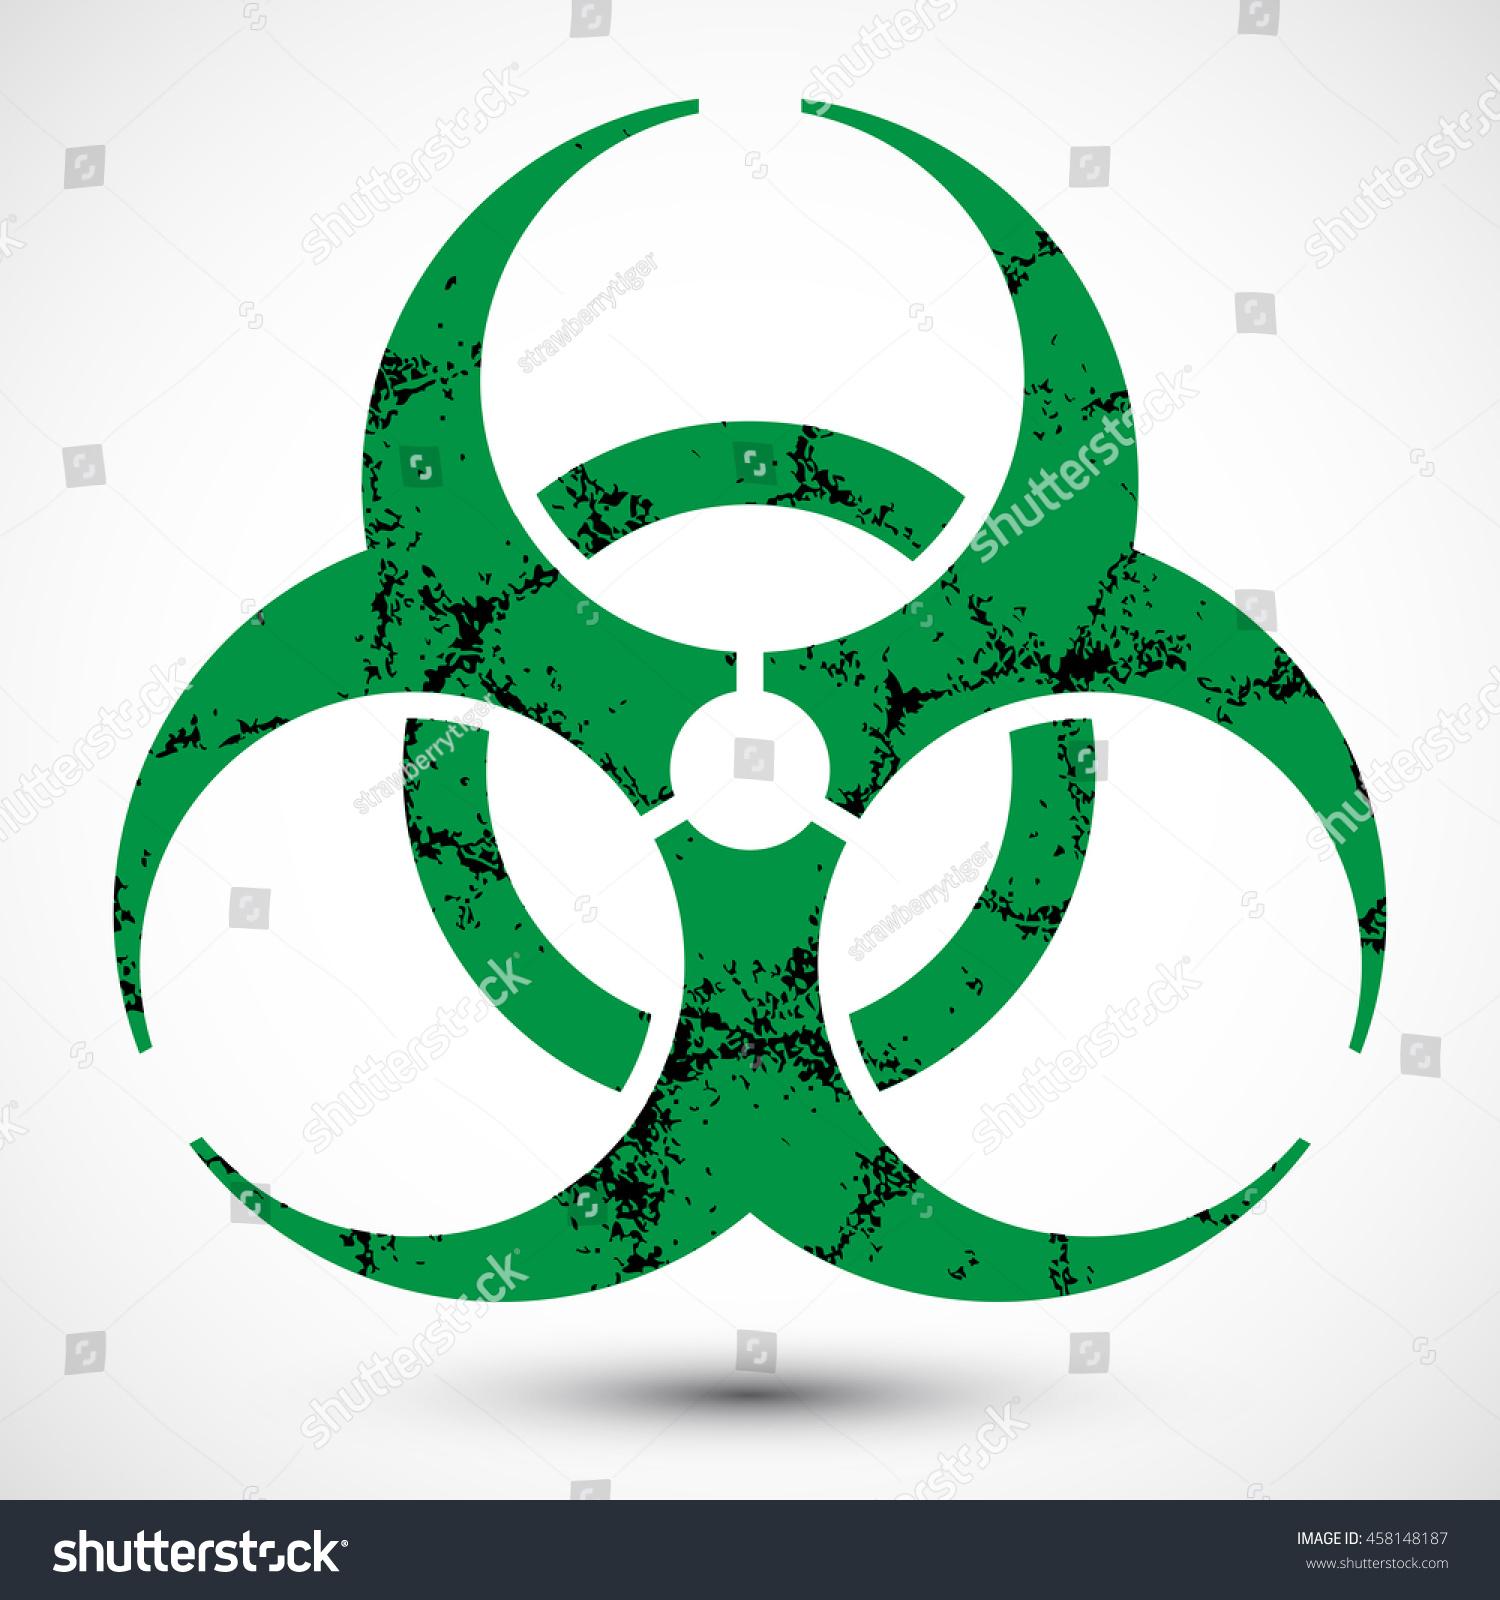 Biohazard Symbol Grunge Texture On Background Stock Illustration